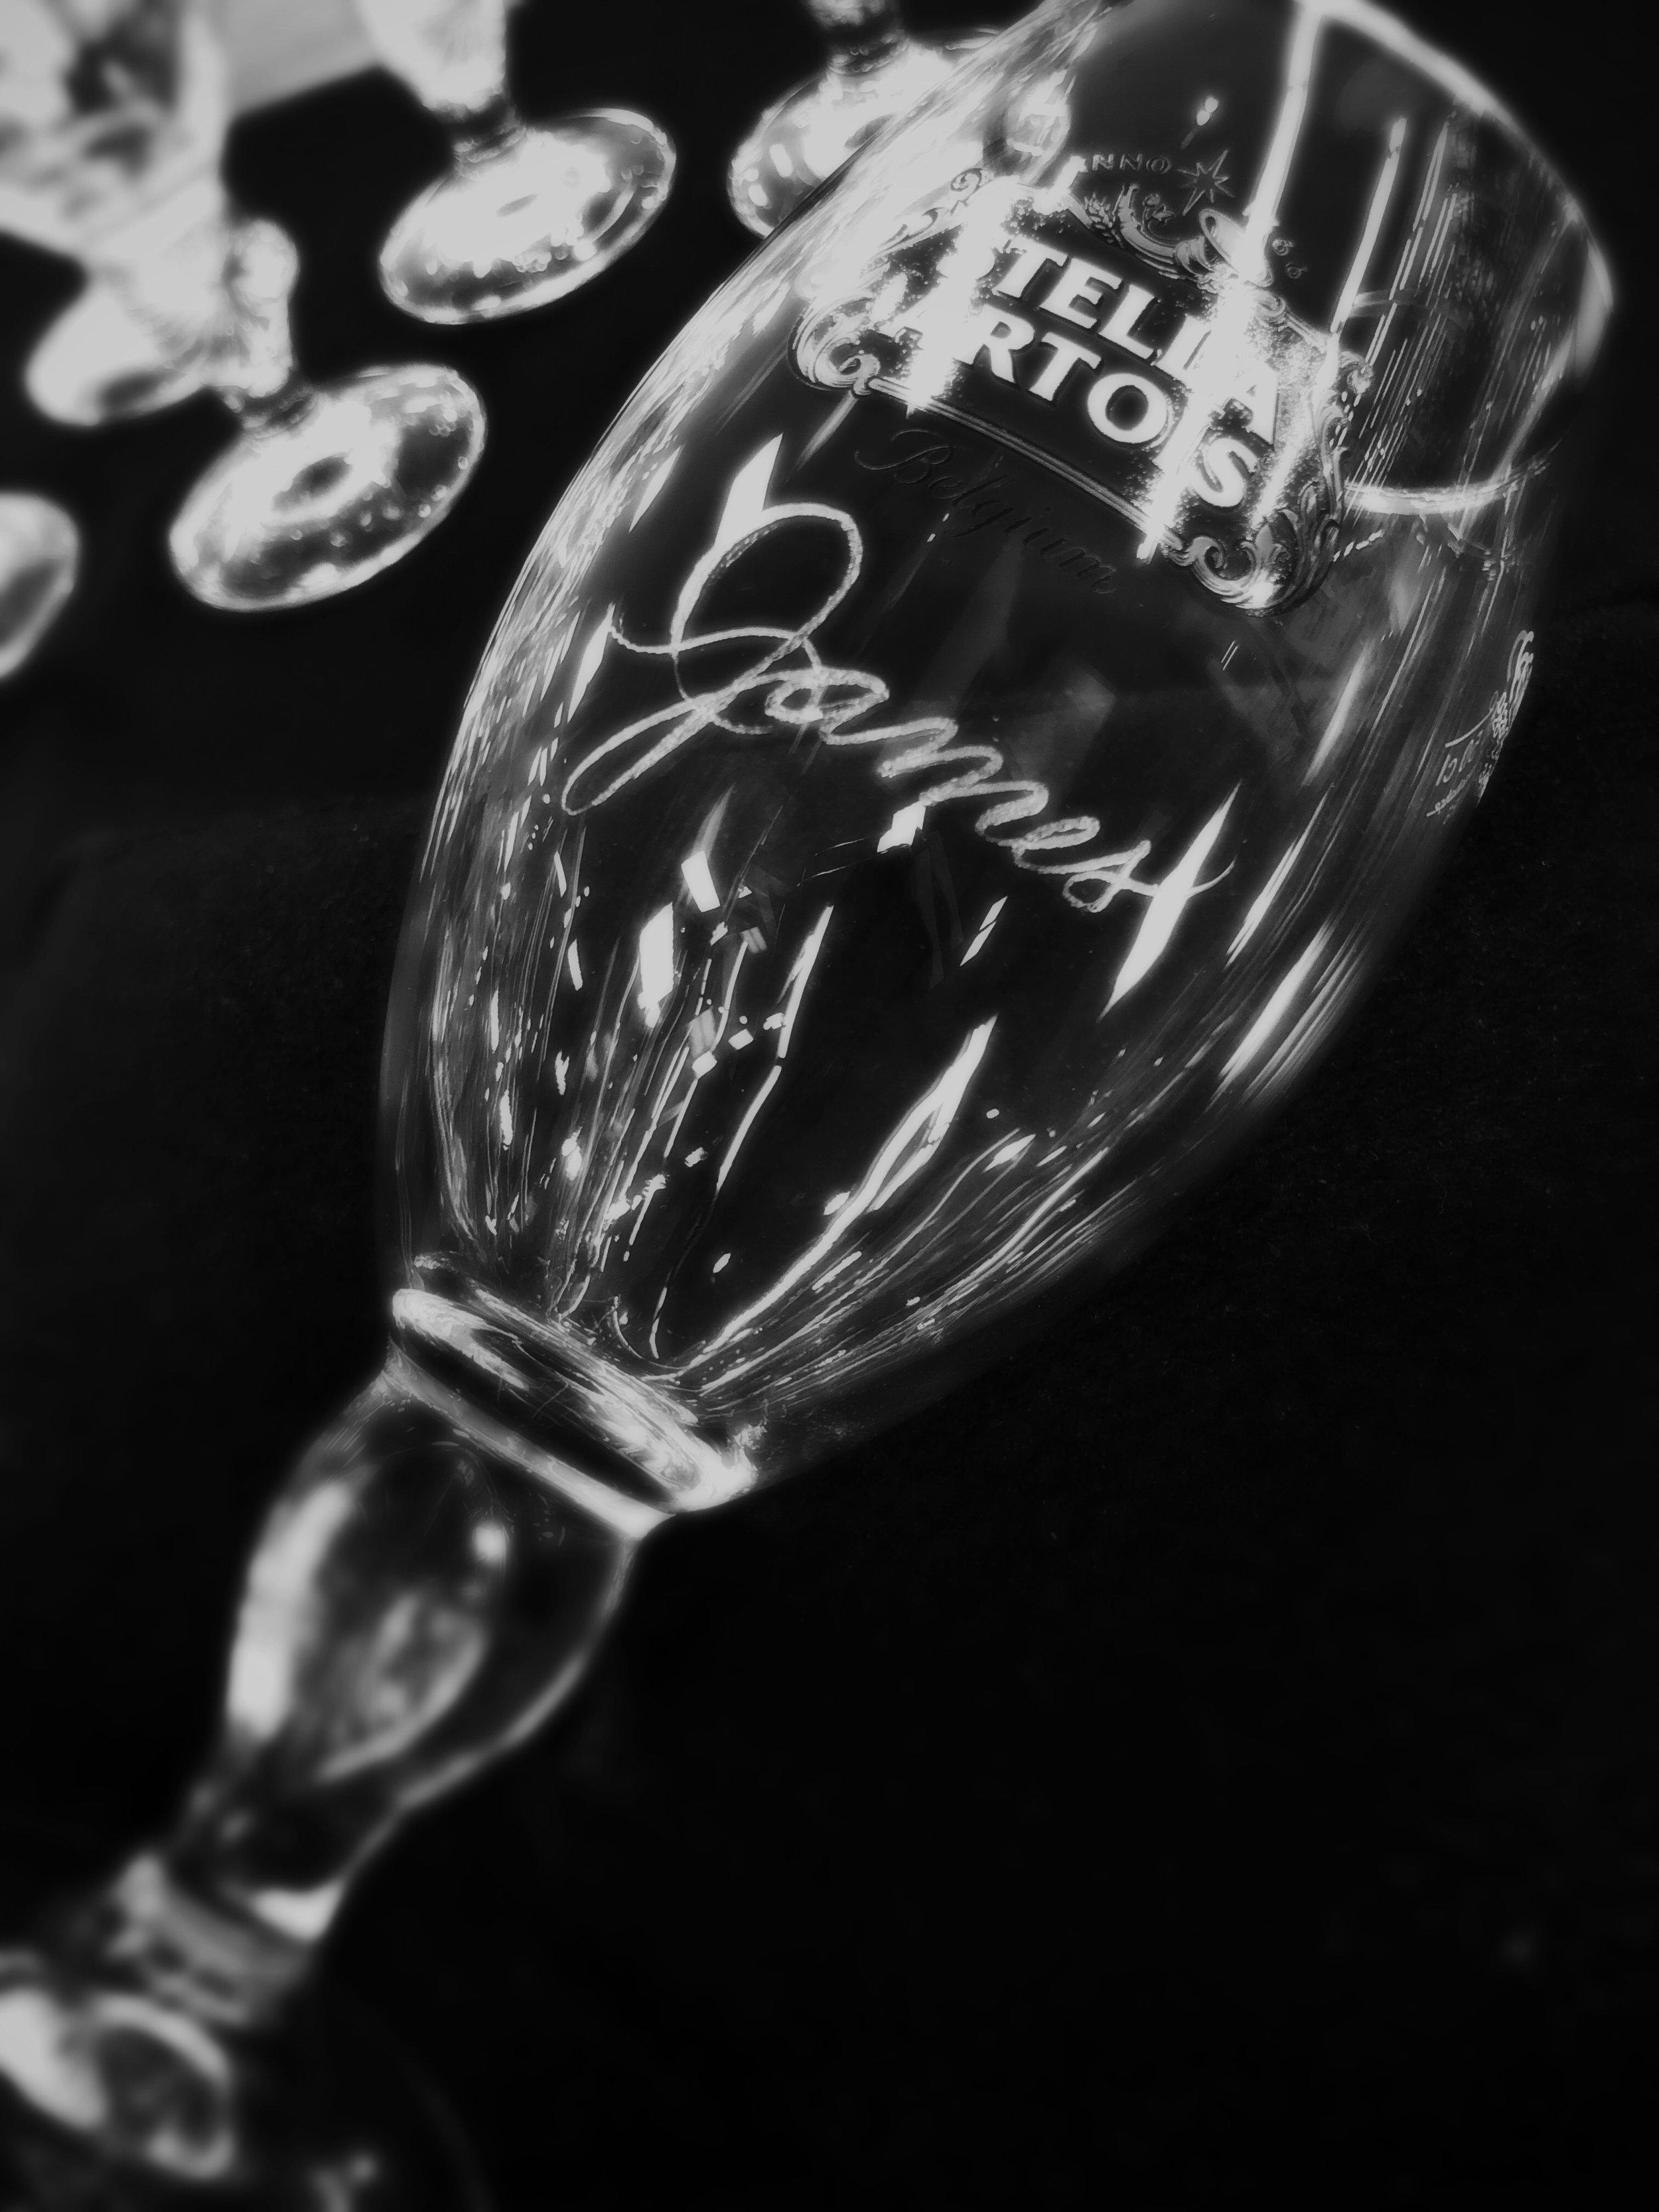 Wine Glass Engraving Houston - Champagne Glass Engraving Houston - Slinging Ink